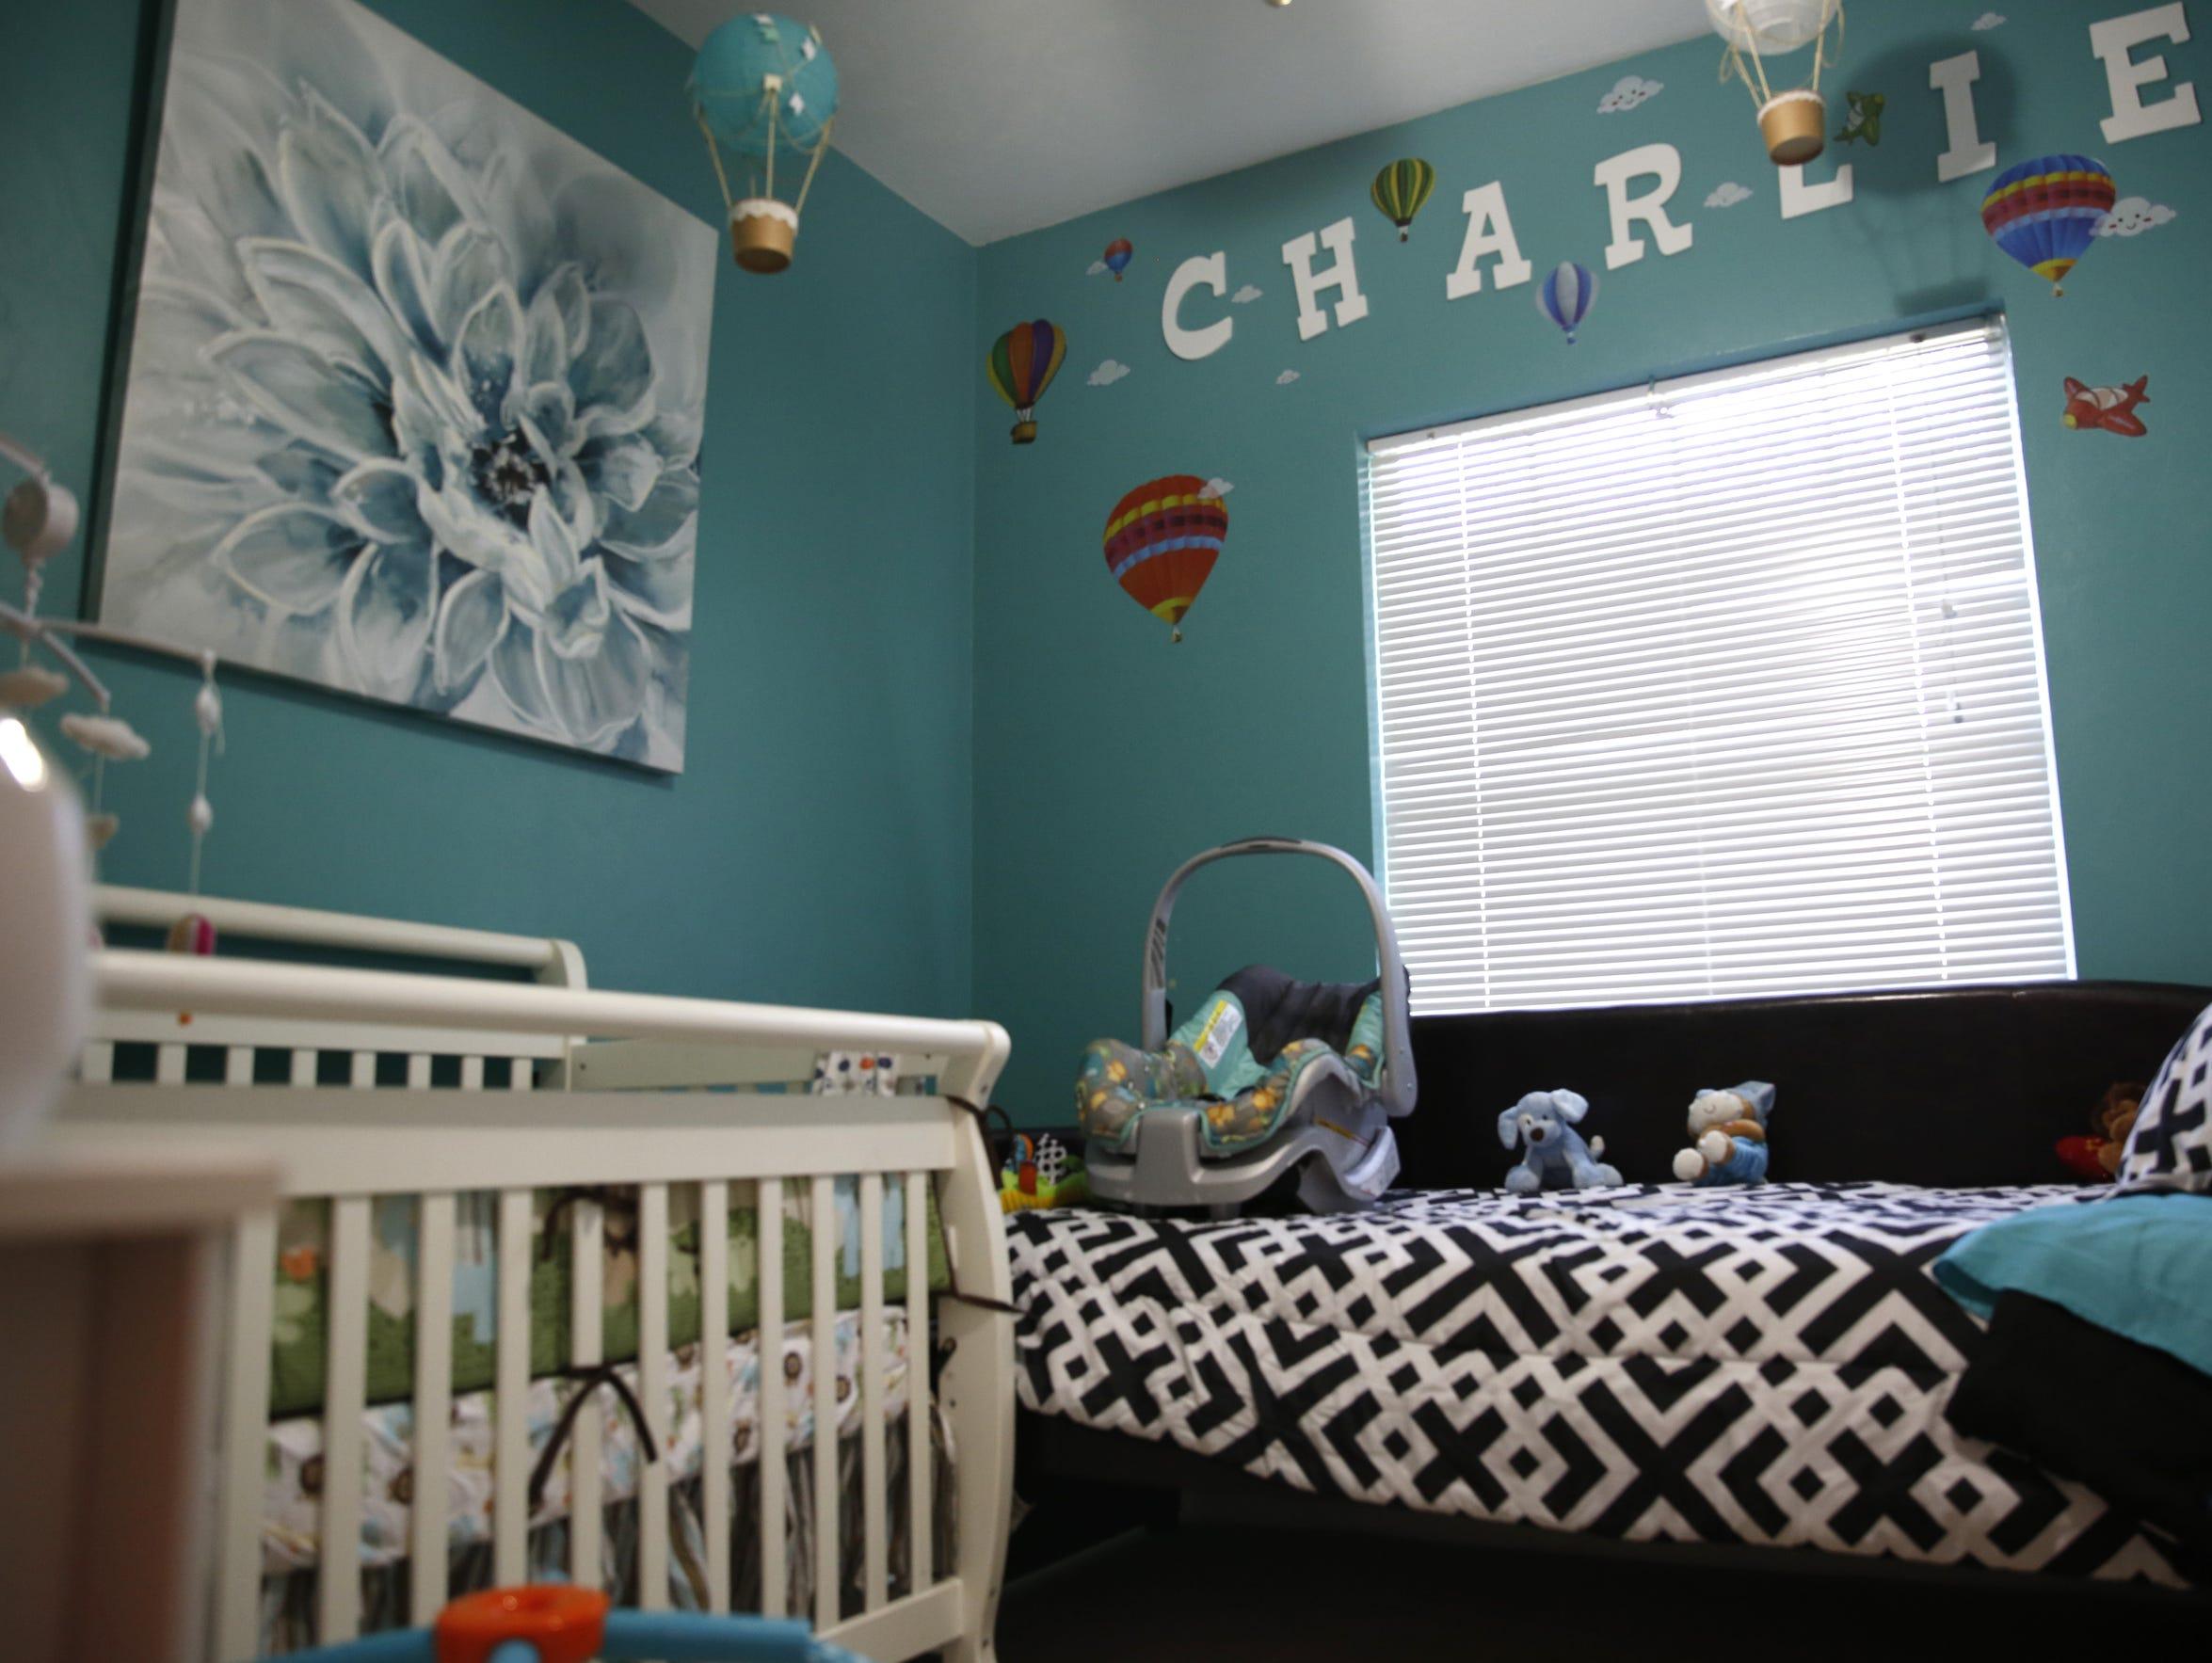 At seven months old Caleb Charlie Nichols sleeps in